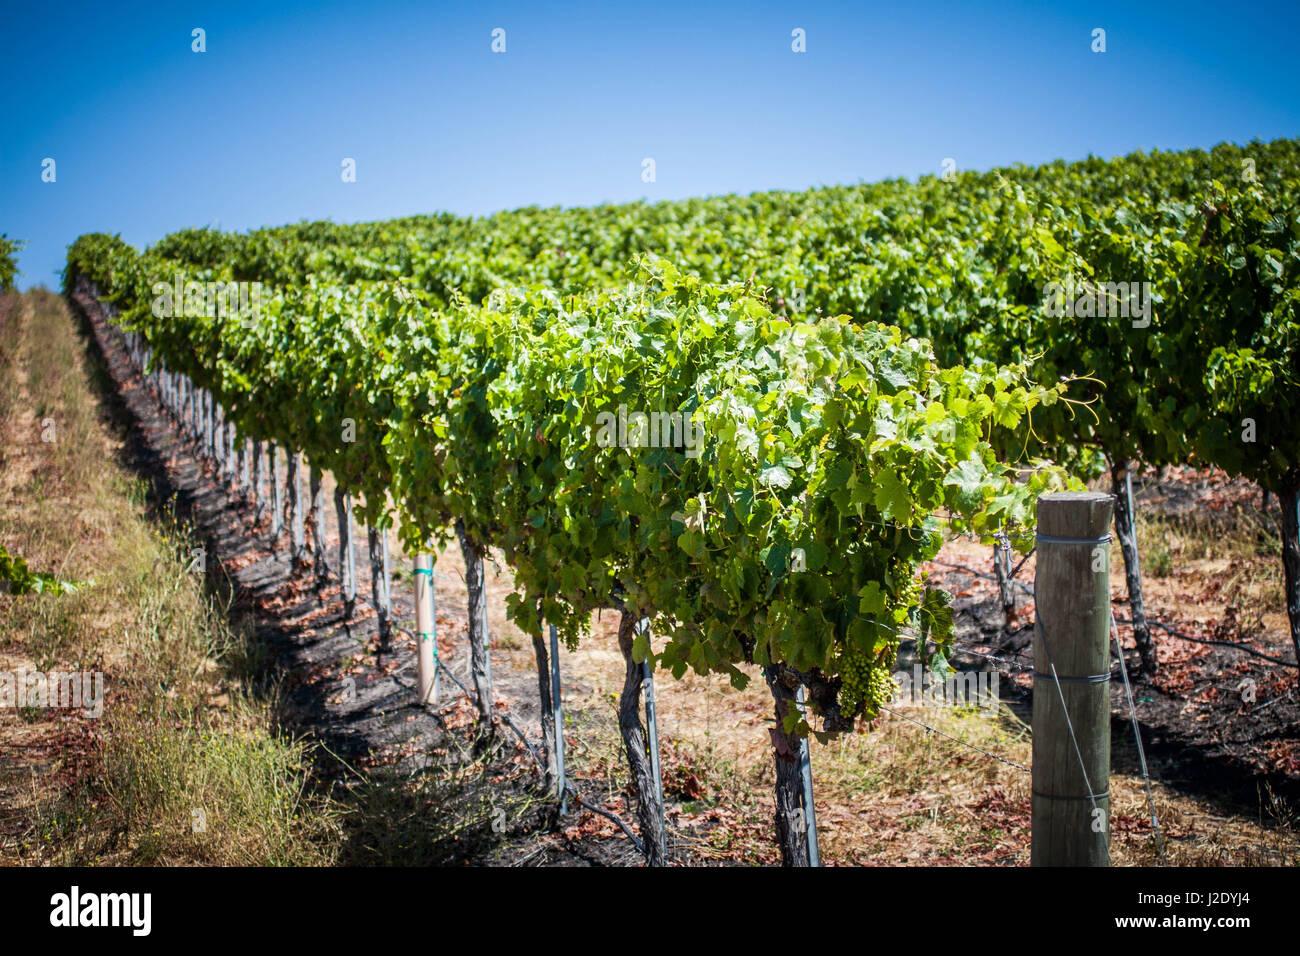 Vineyard5694   - Stock Image